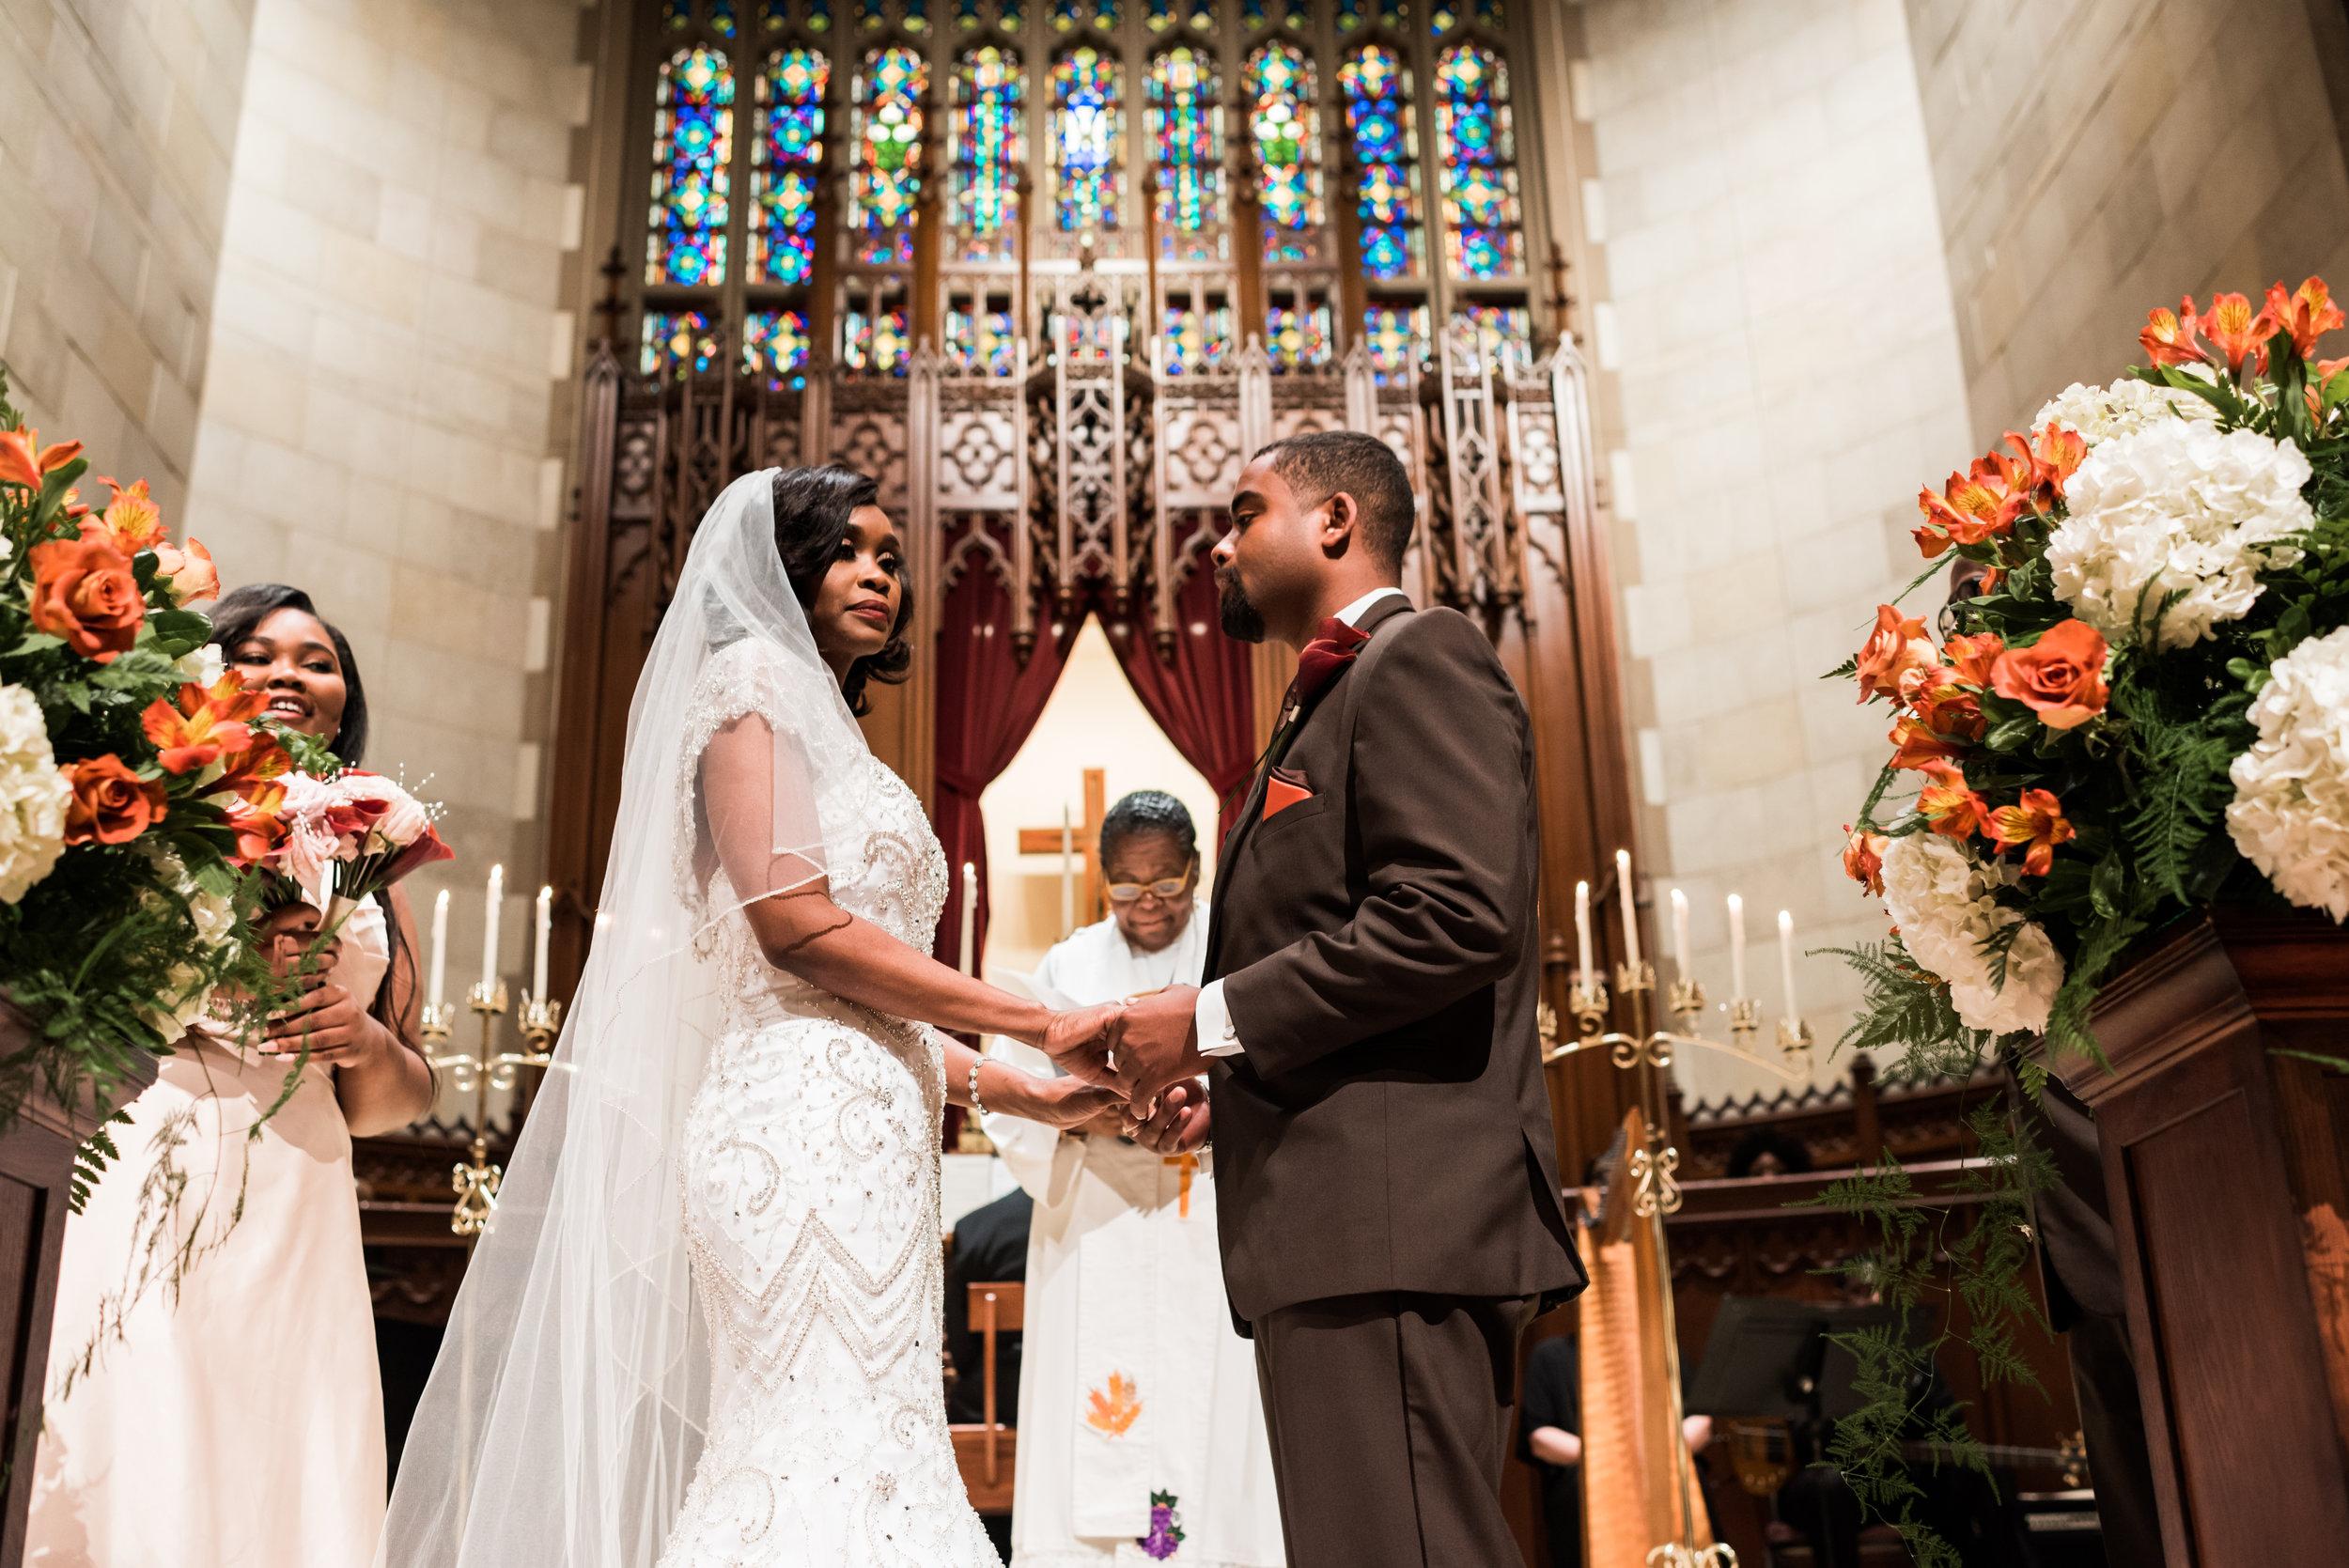 st-louis-wedding-photographer-third-baptist-church-387.jpg